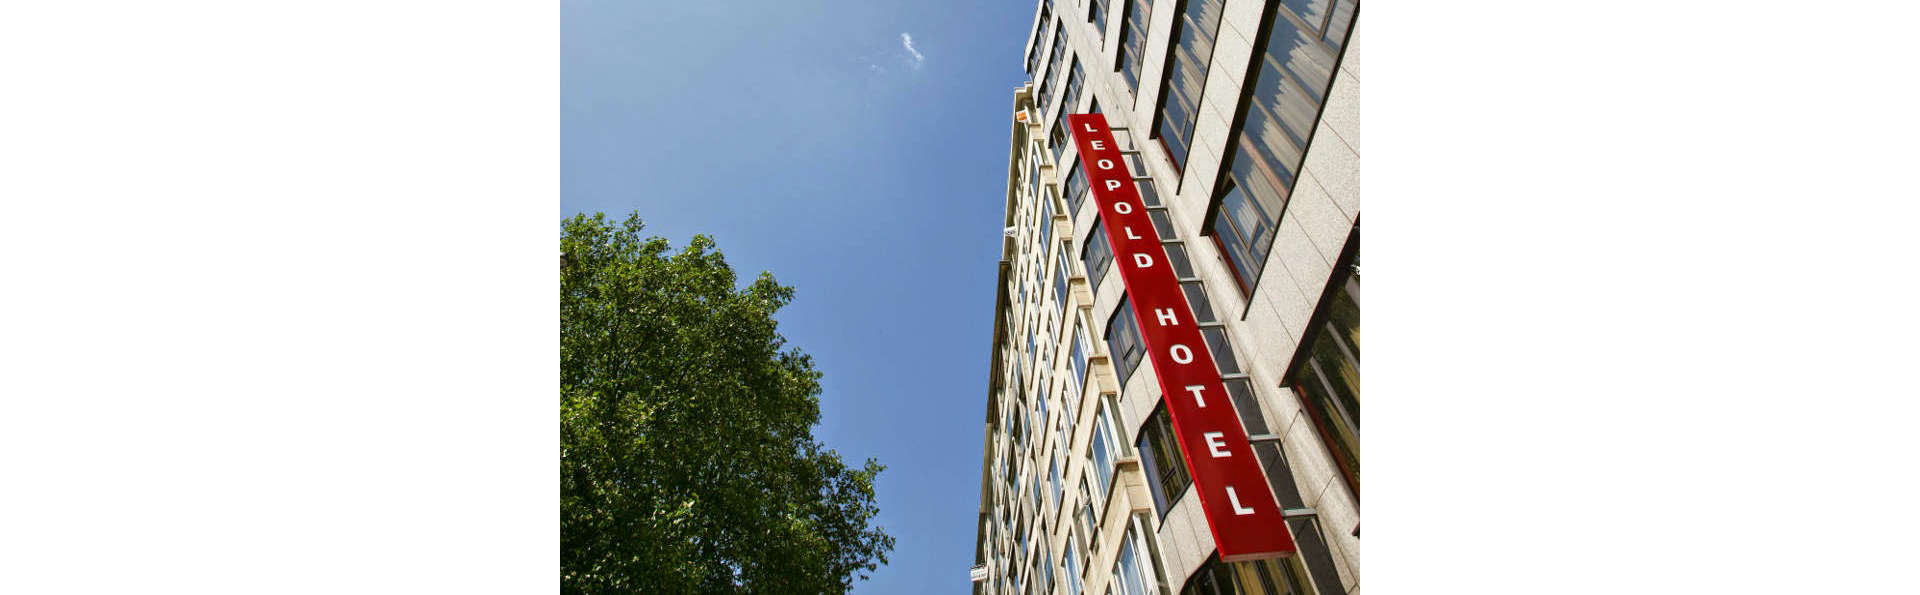 Leopold Hotel Antwerpen - EDIT_FRONT_01.jpg